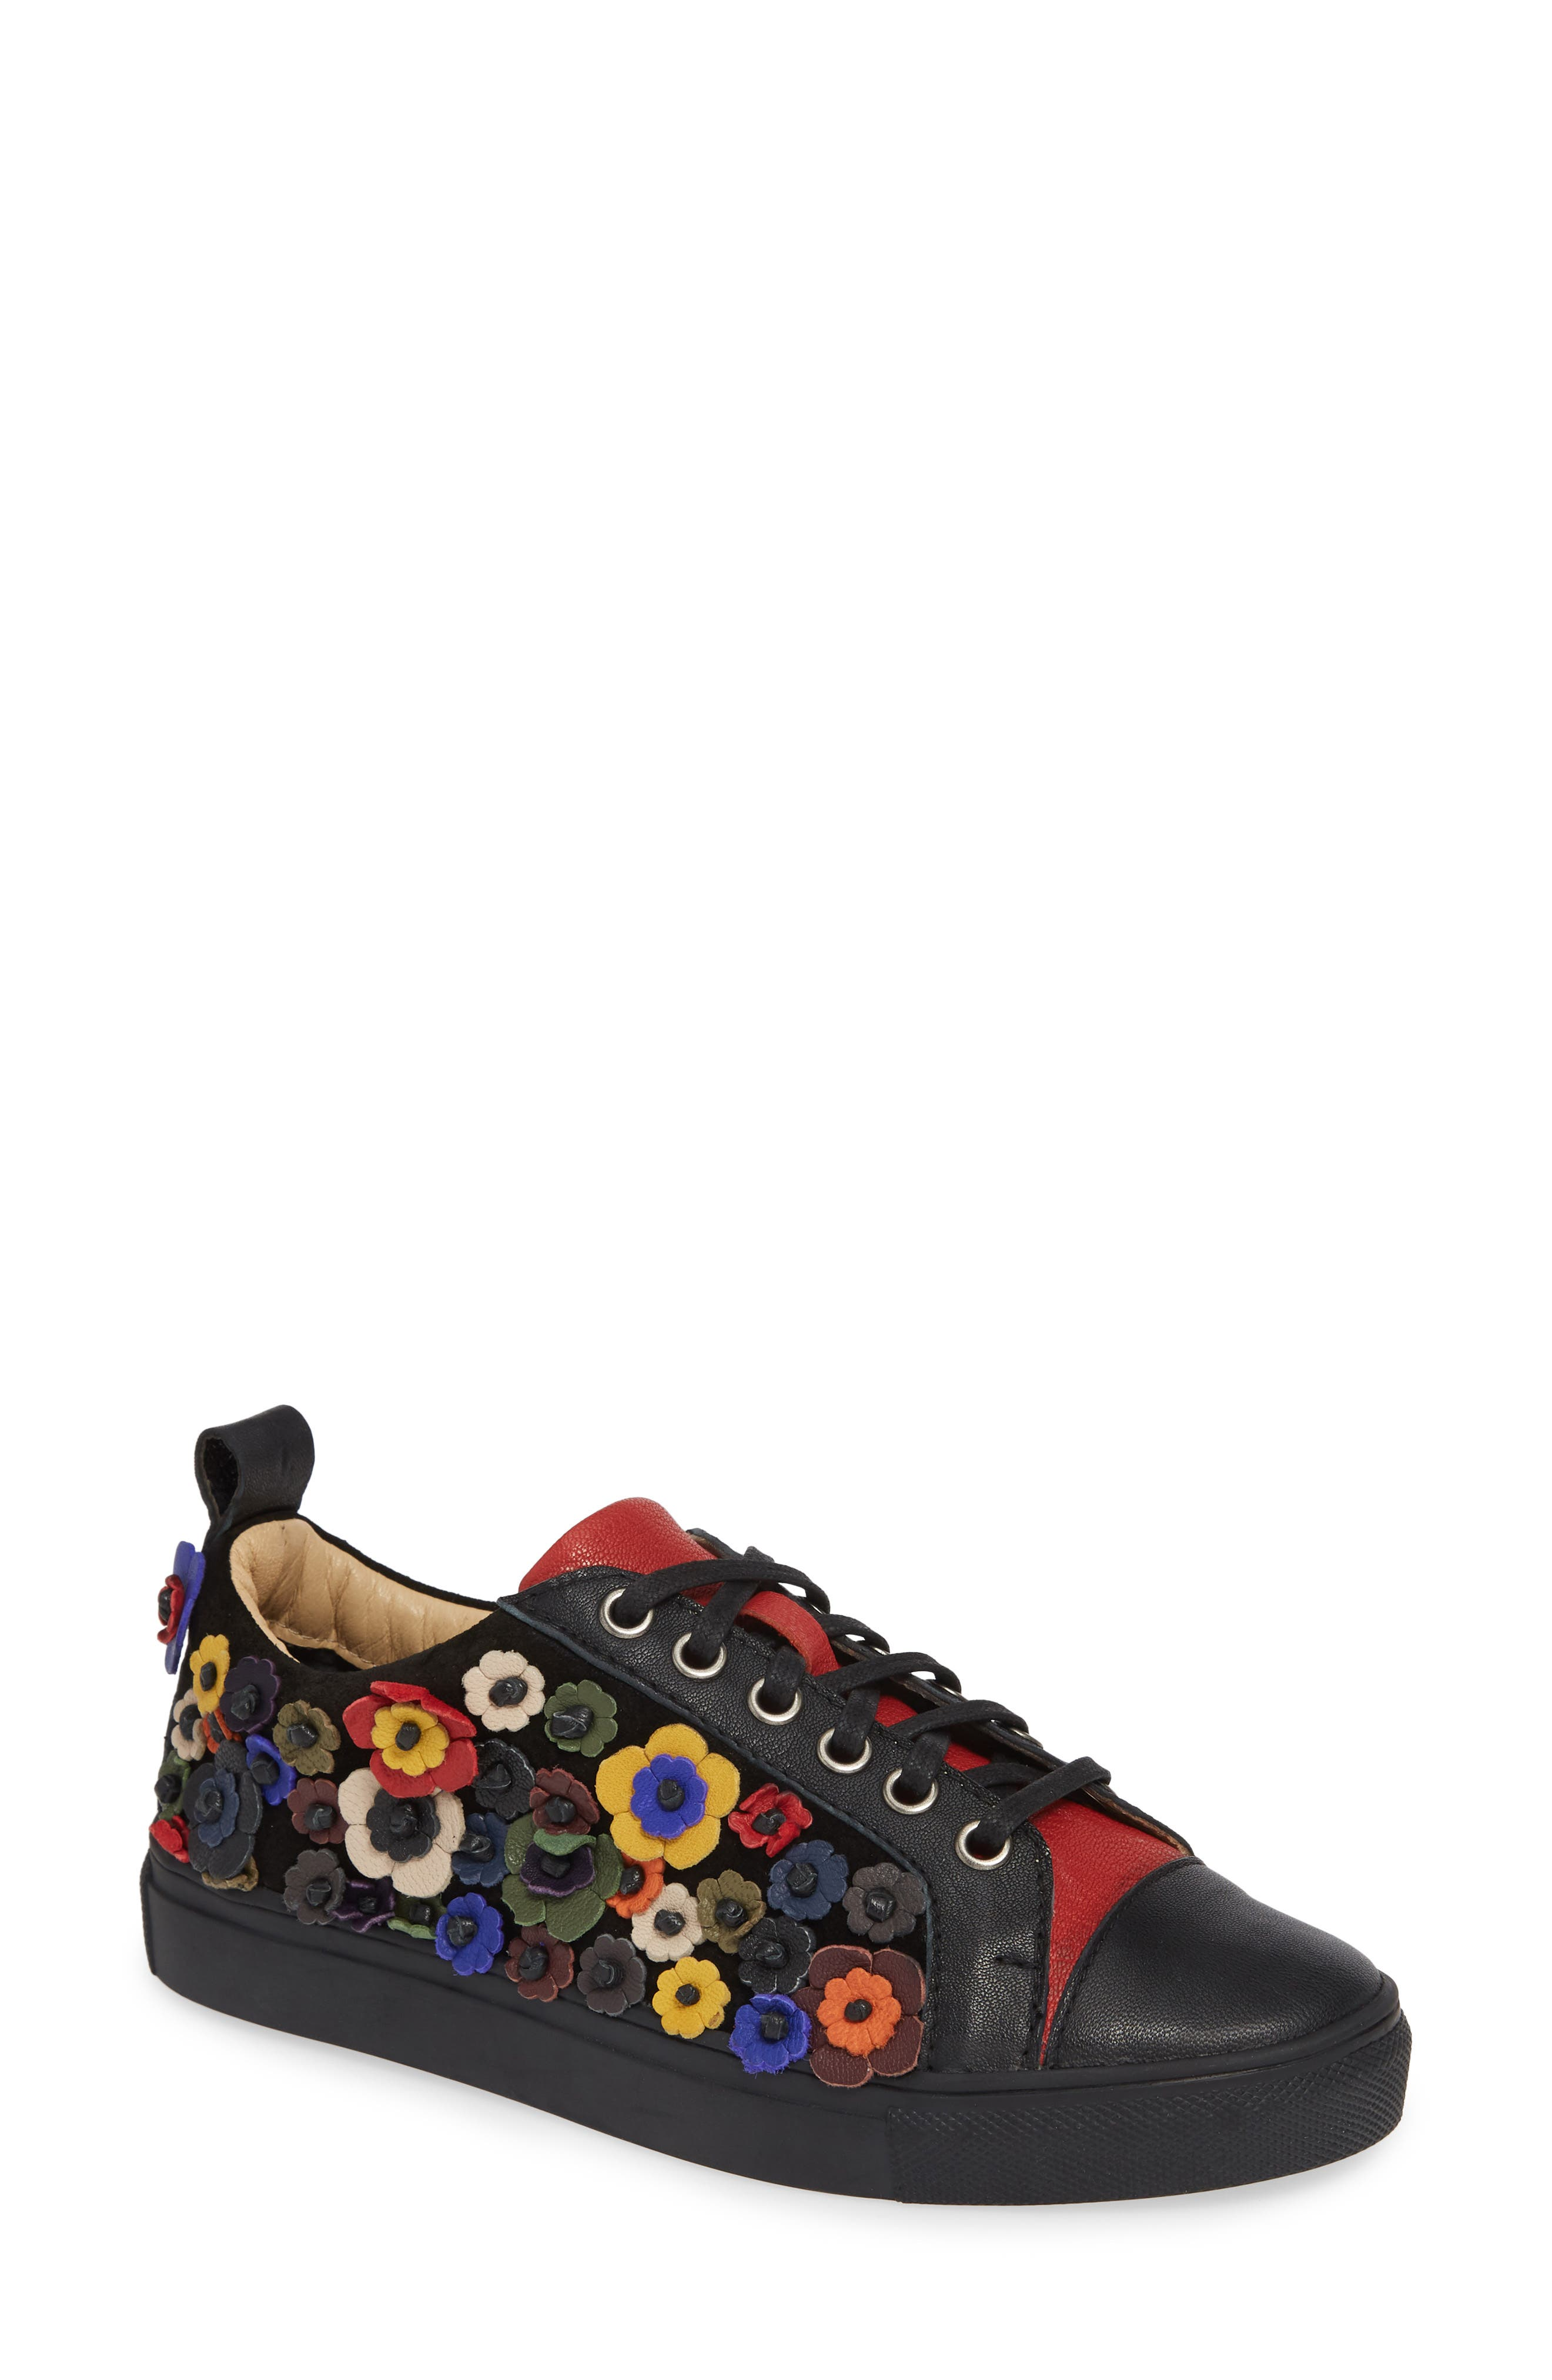 SHERIDAN MIA, Satyr Sneaker, Main thumbnail 1, color, BLACK LEATHER